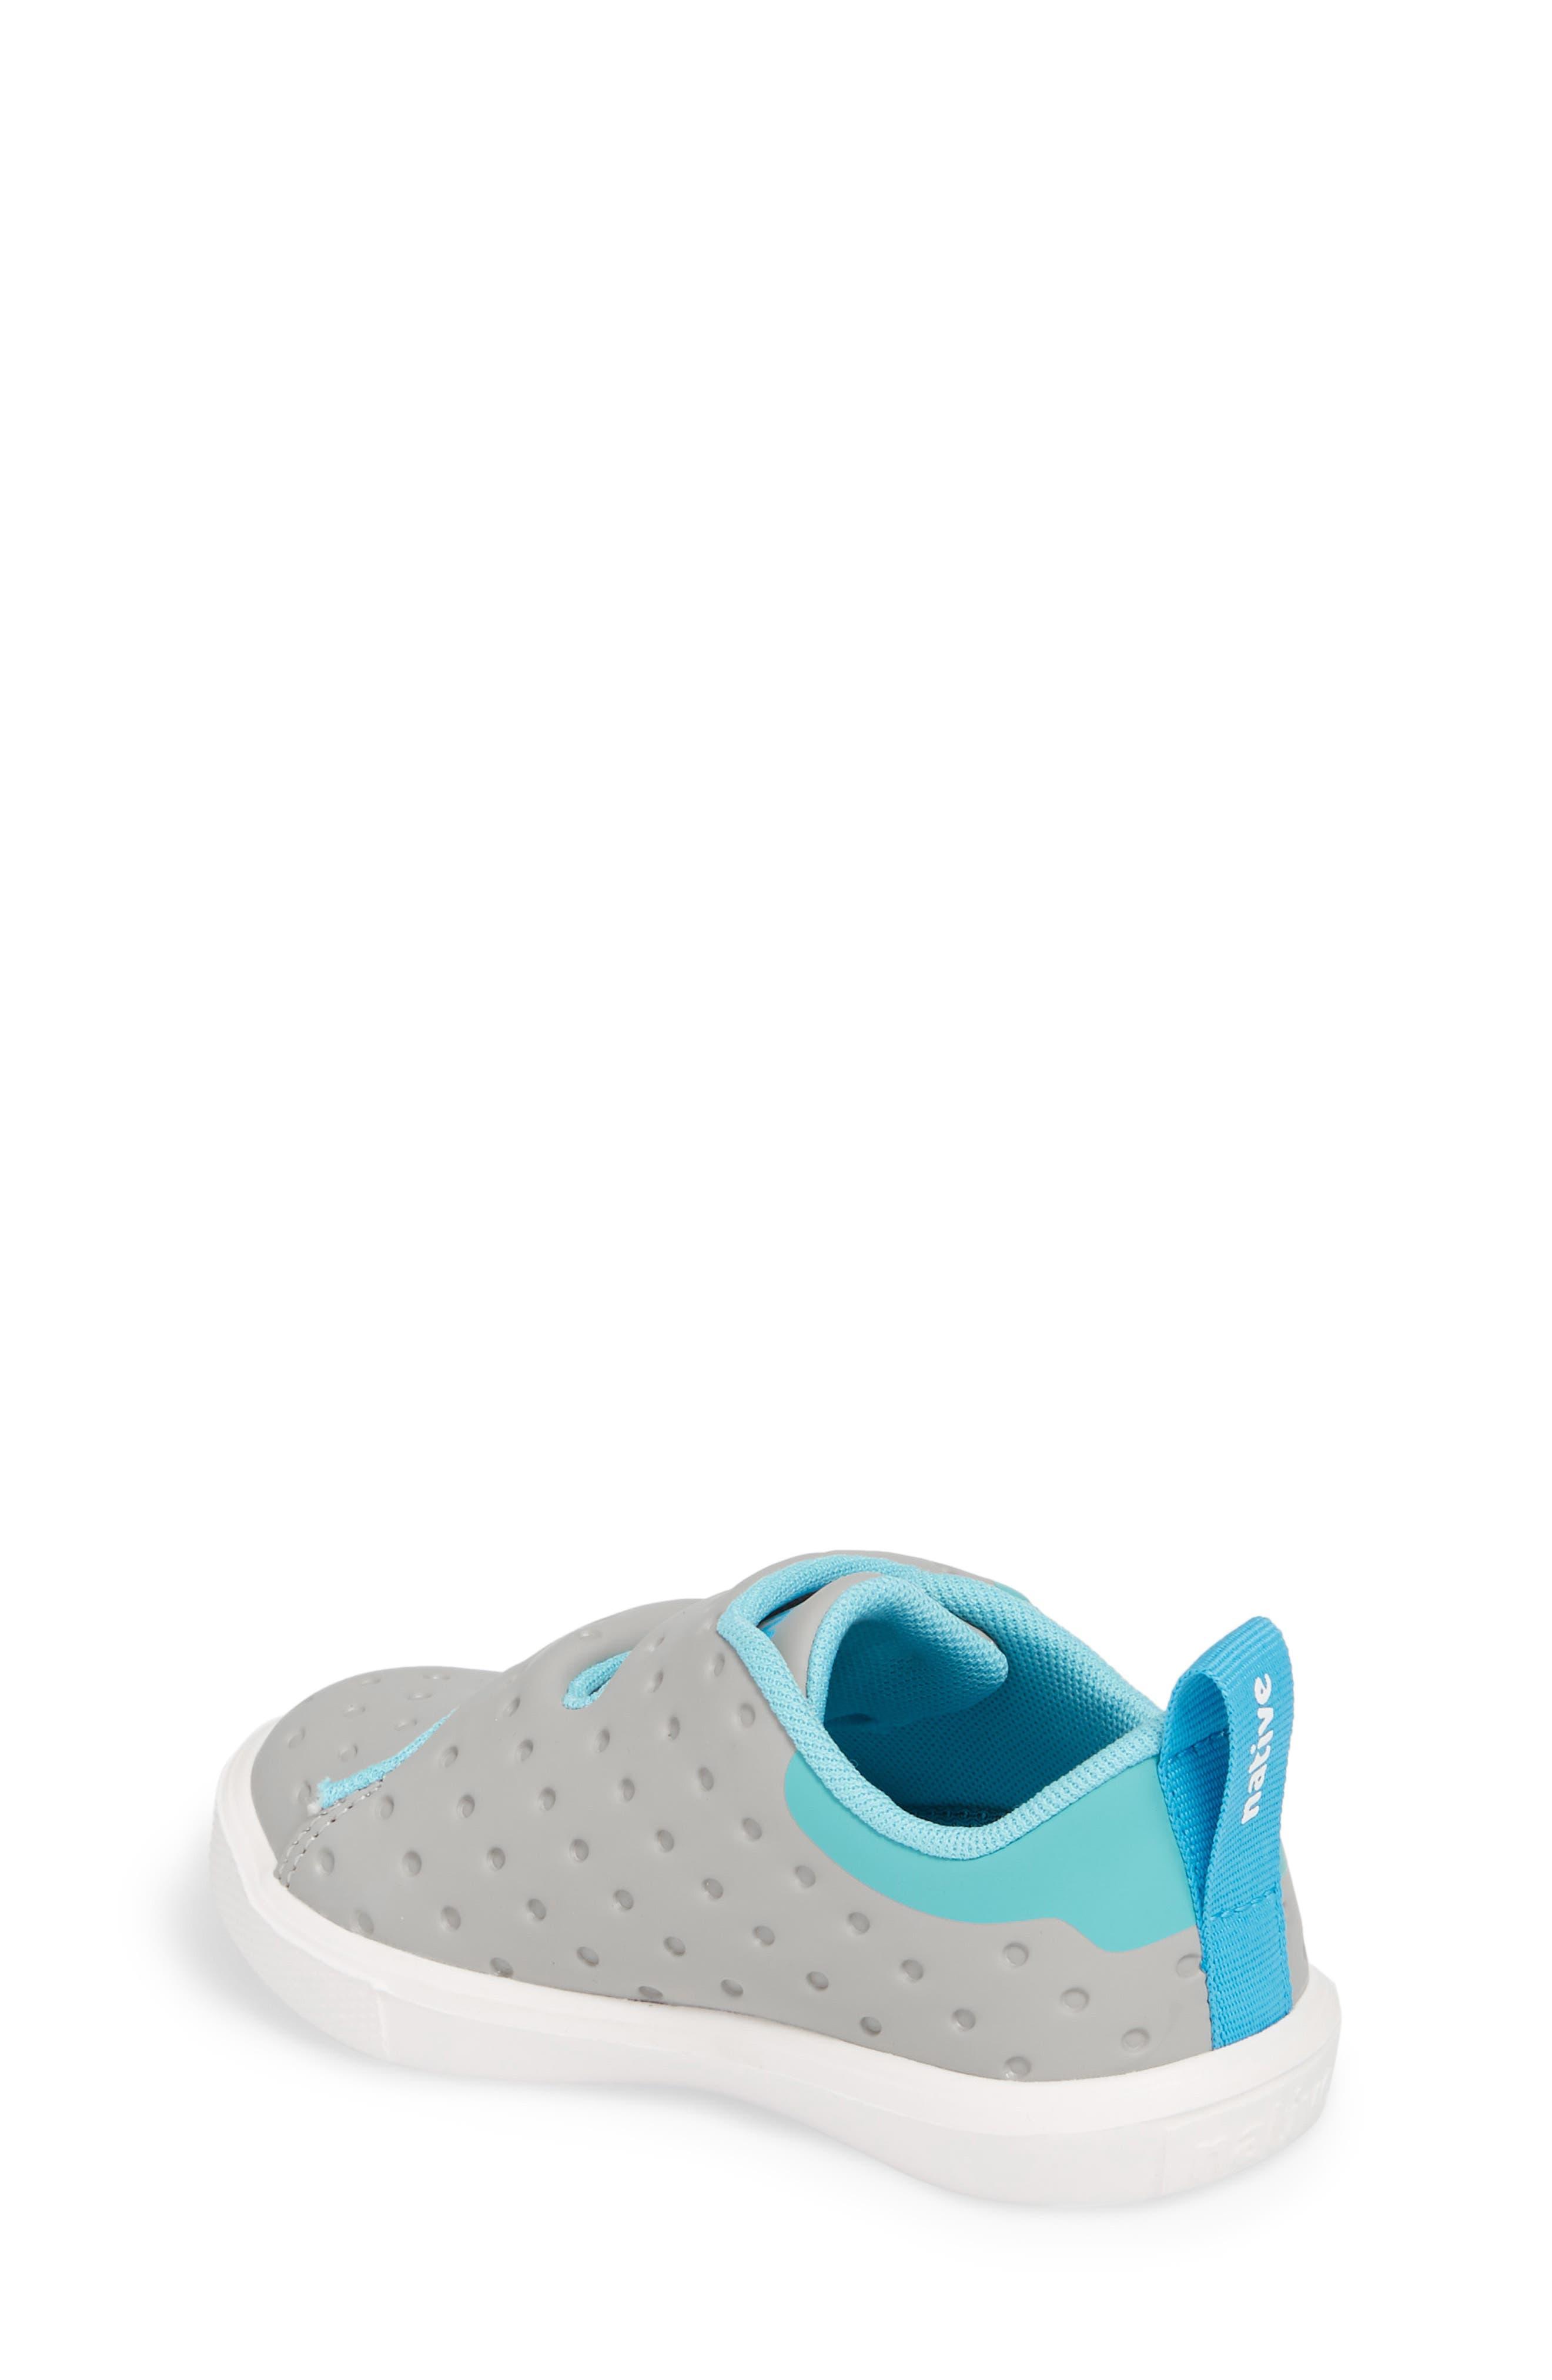 Monaco Sneaker,                             Alternate thumbnail 2, color,                             PIGEON GREY/ POOL BOOL/ WHITE